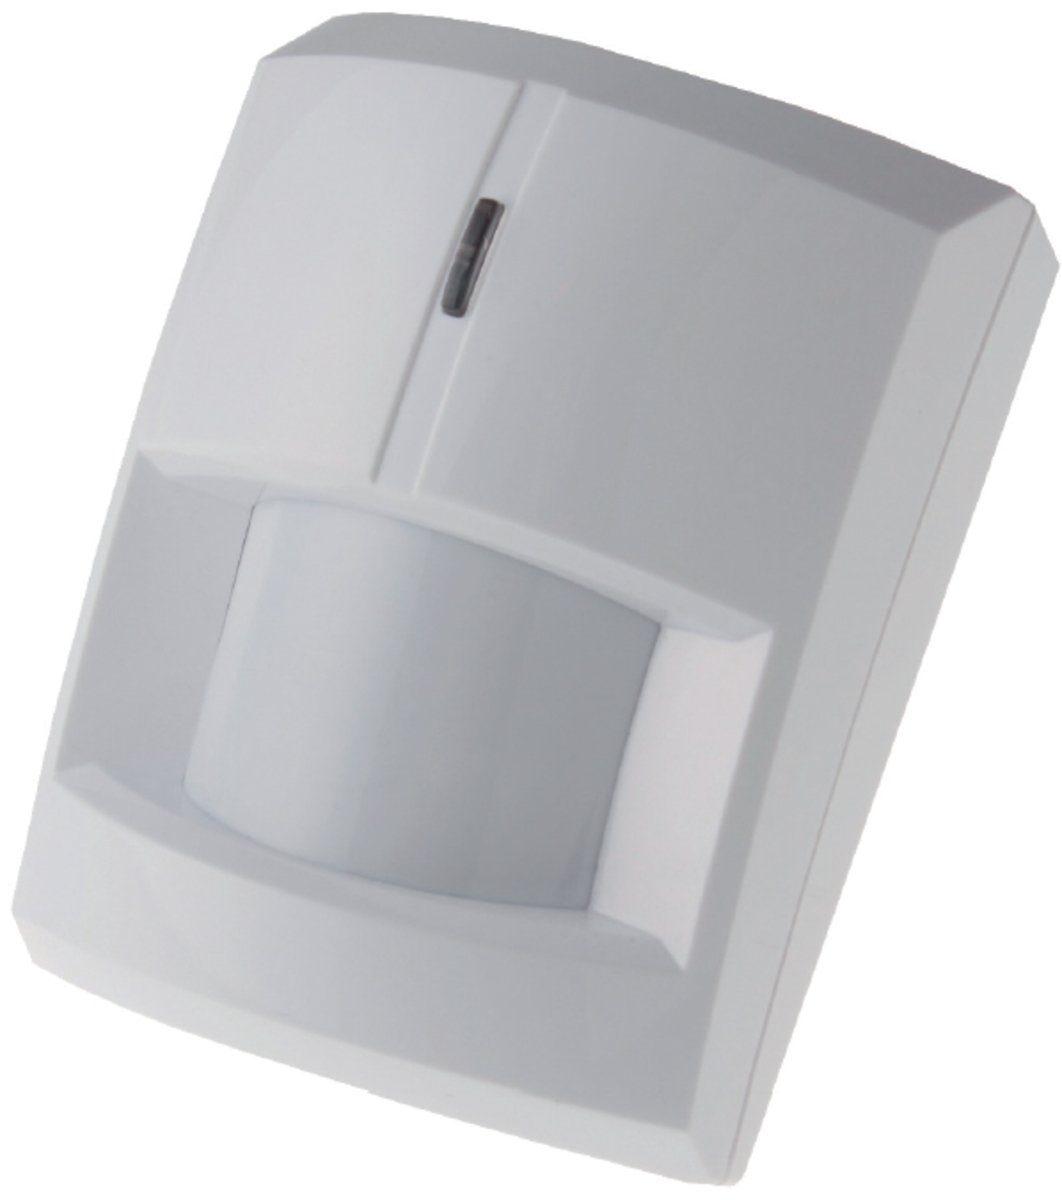 Blaupunkt Smart Home Zubehör »IR-S1L Funk-Bewegungsmelder«